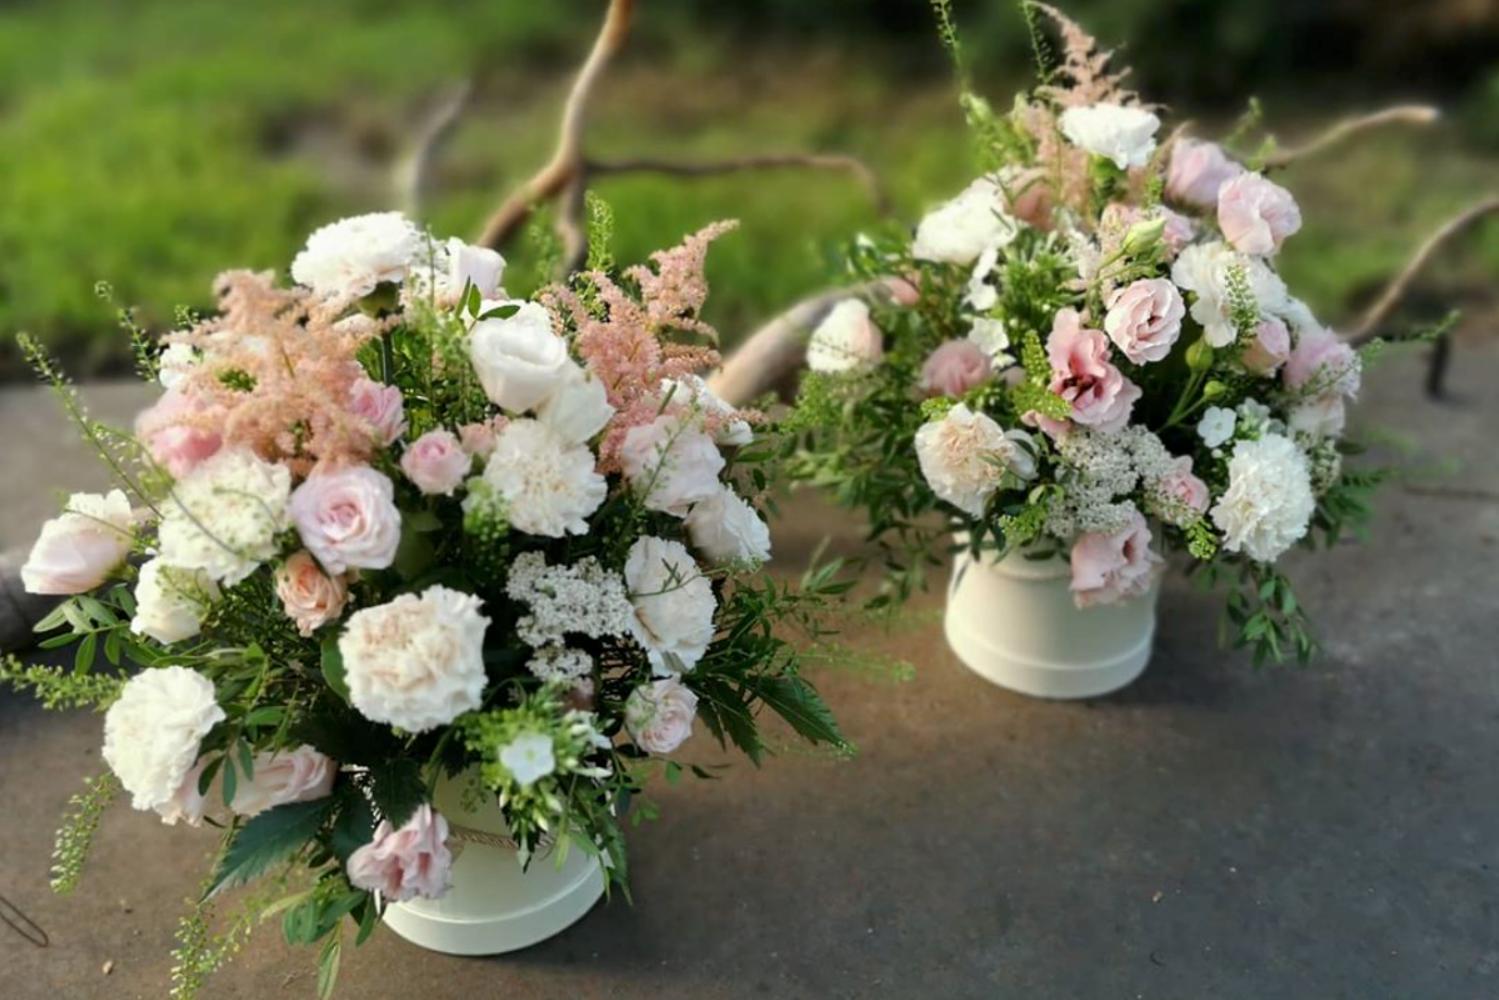 Kwiaciarnia Atena_flowerbox